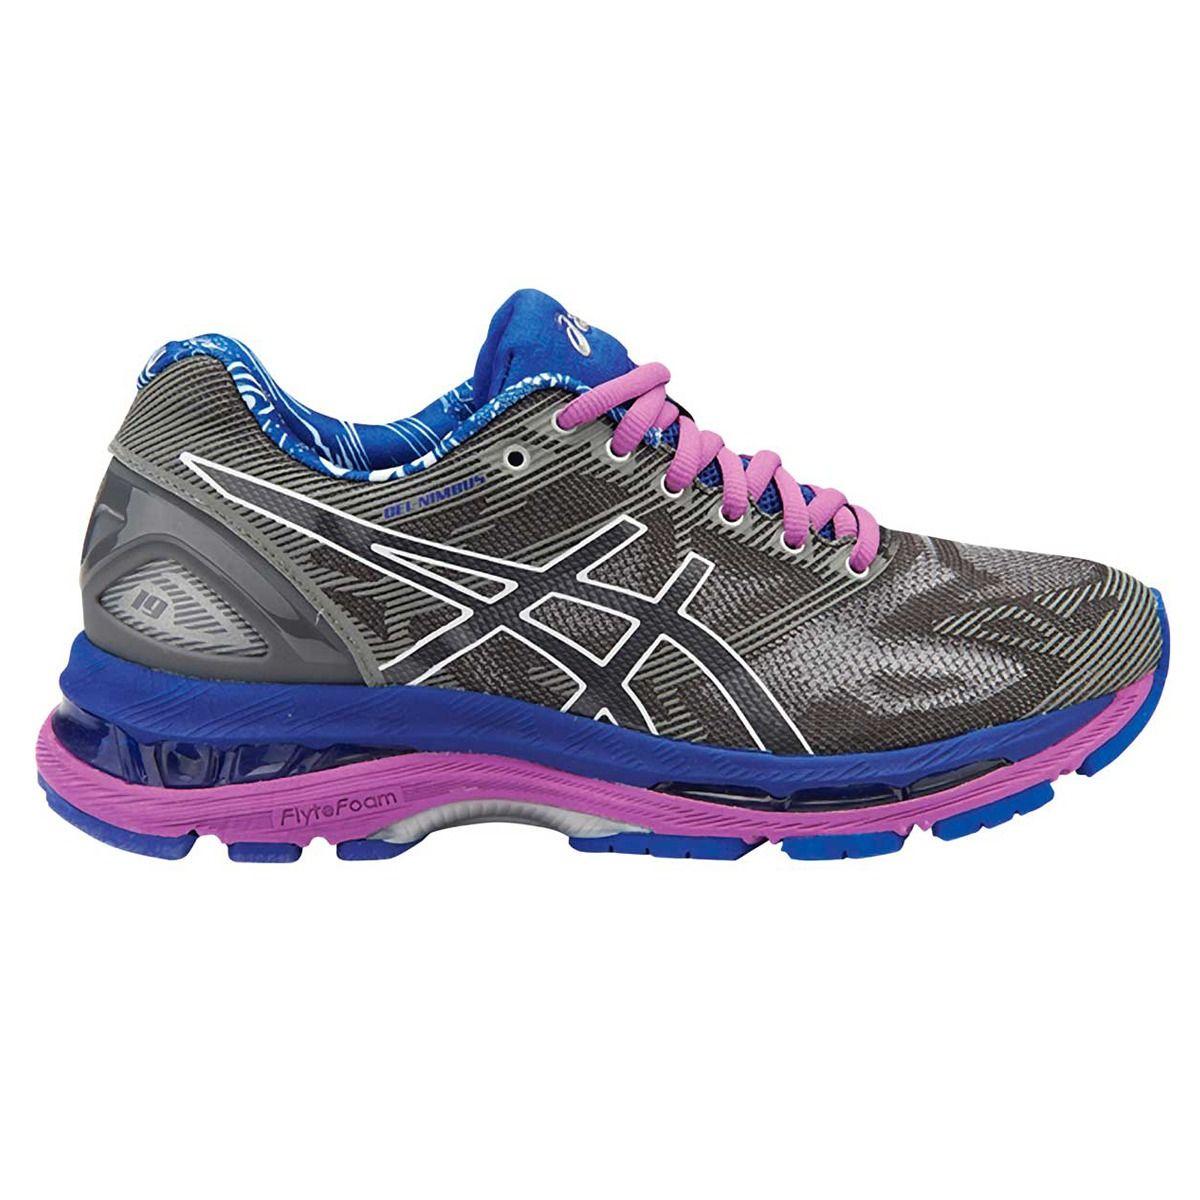 Asics Gel Nimbus 19 Lite Show Women's Running Shoes - rebel